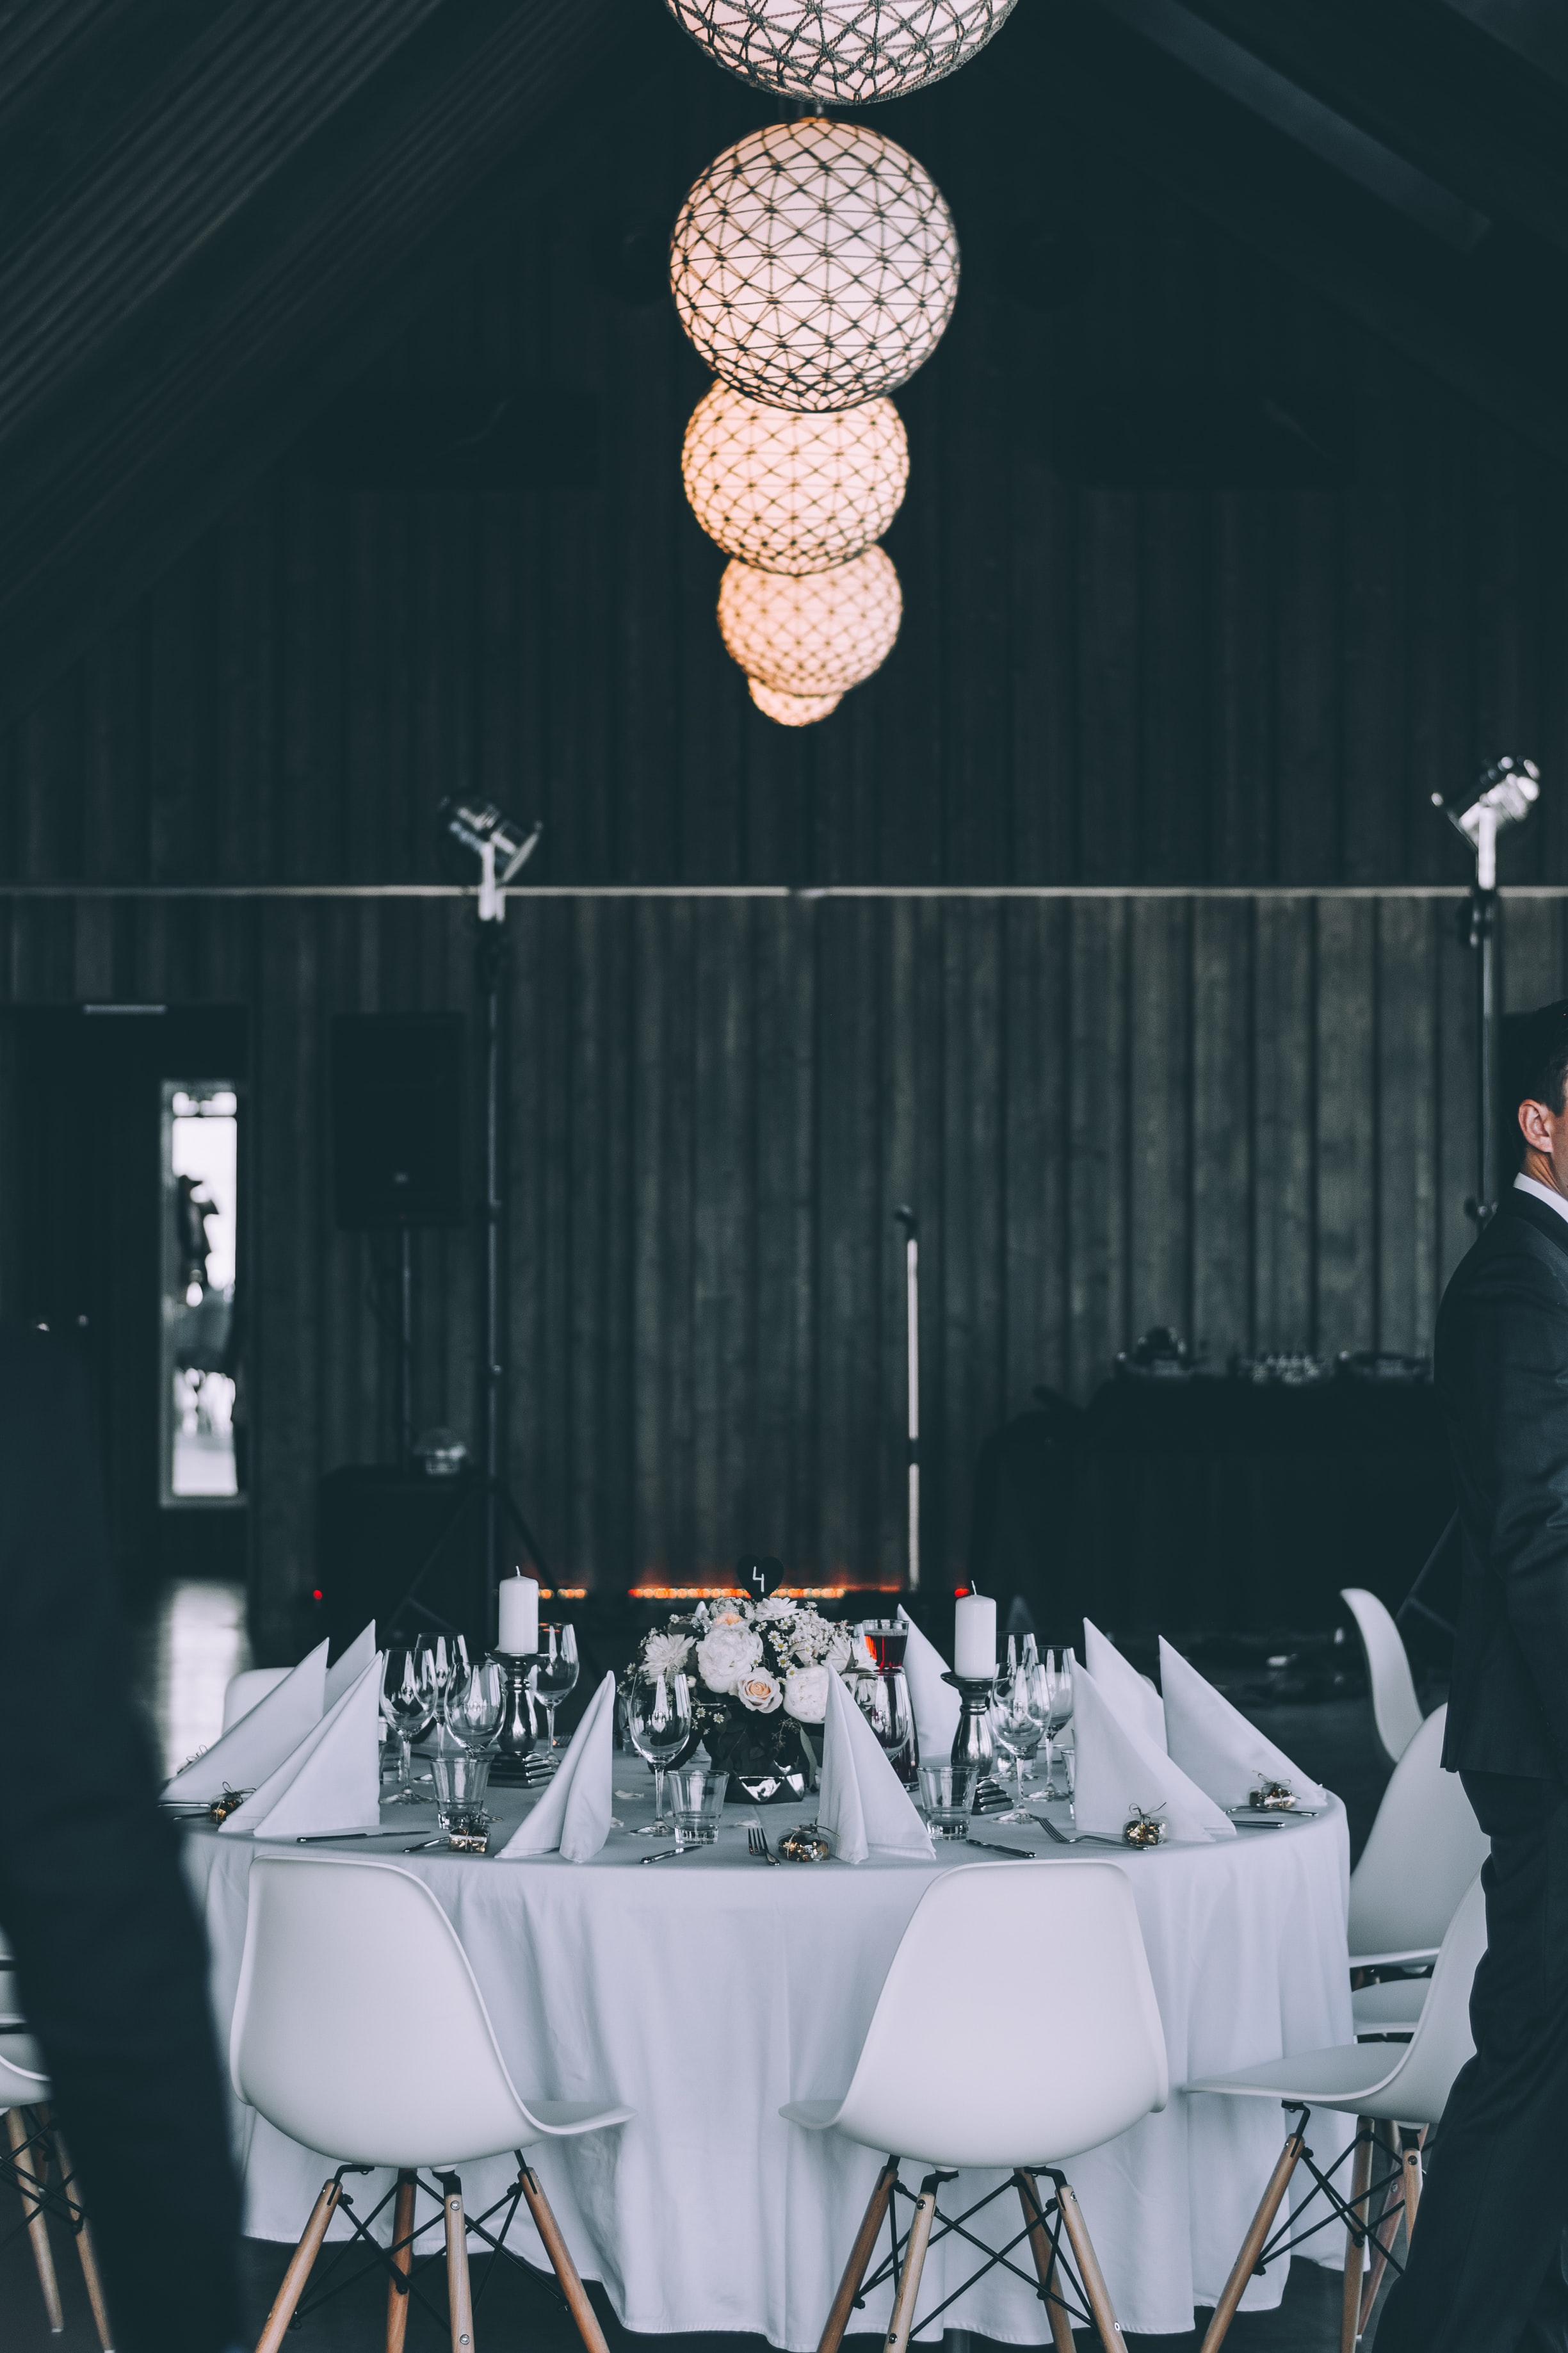 An elegantly set table at a social gathering in Estonia